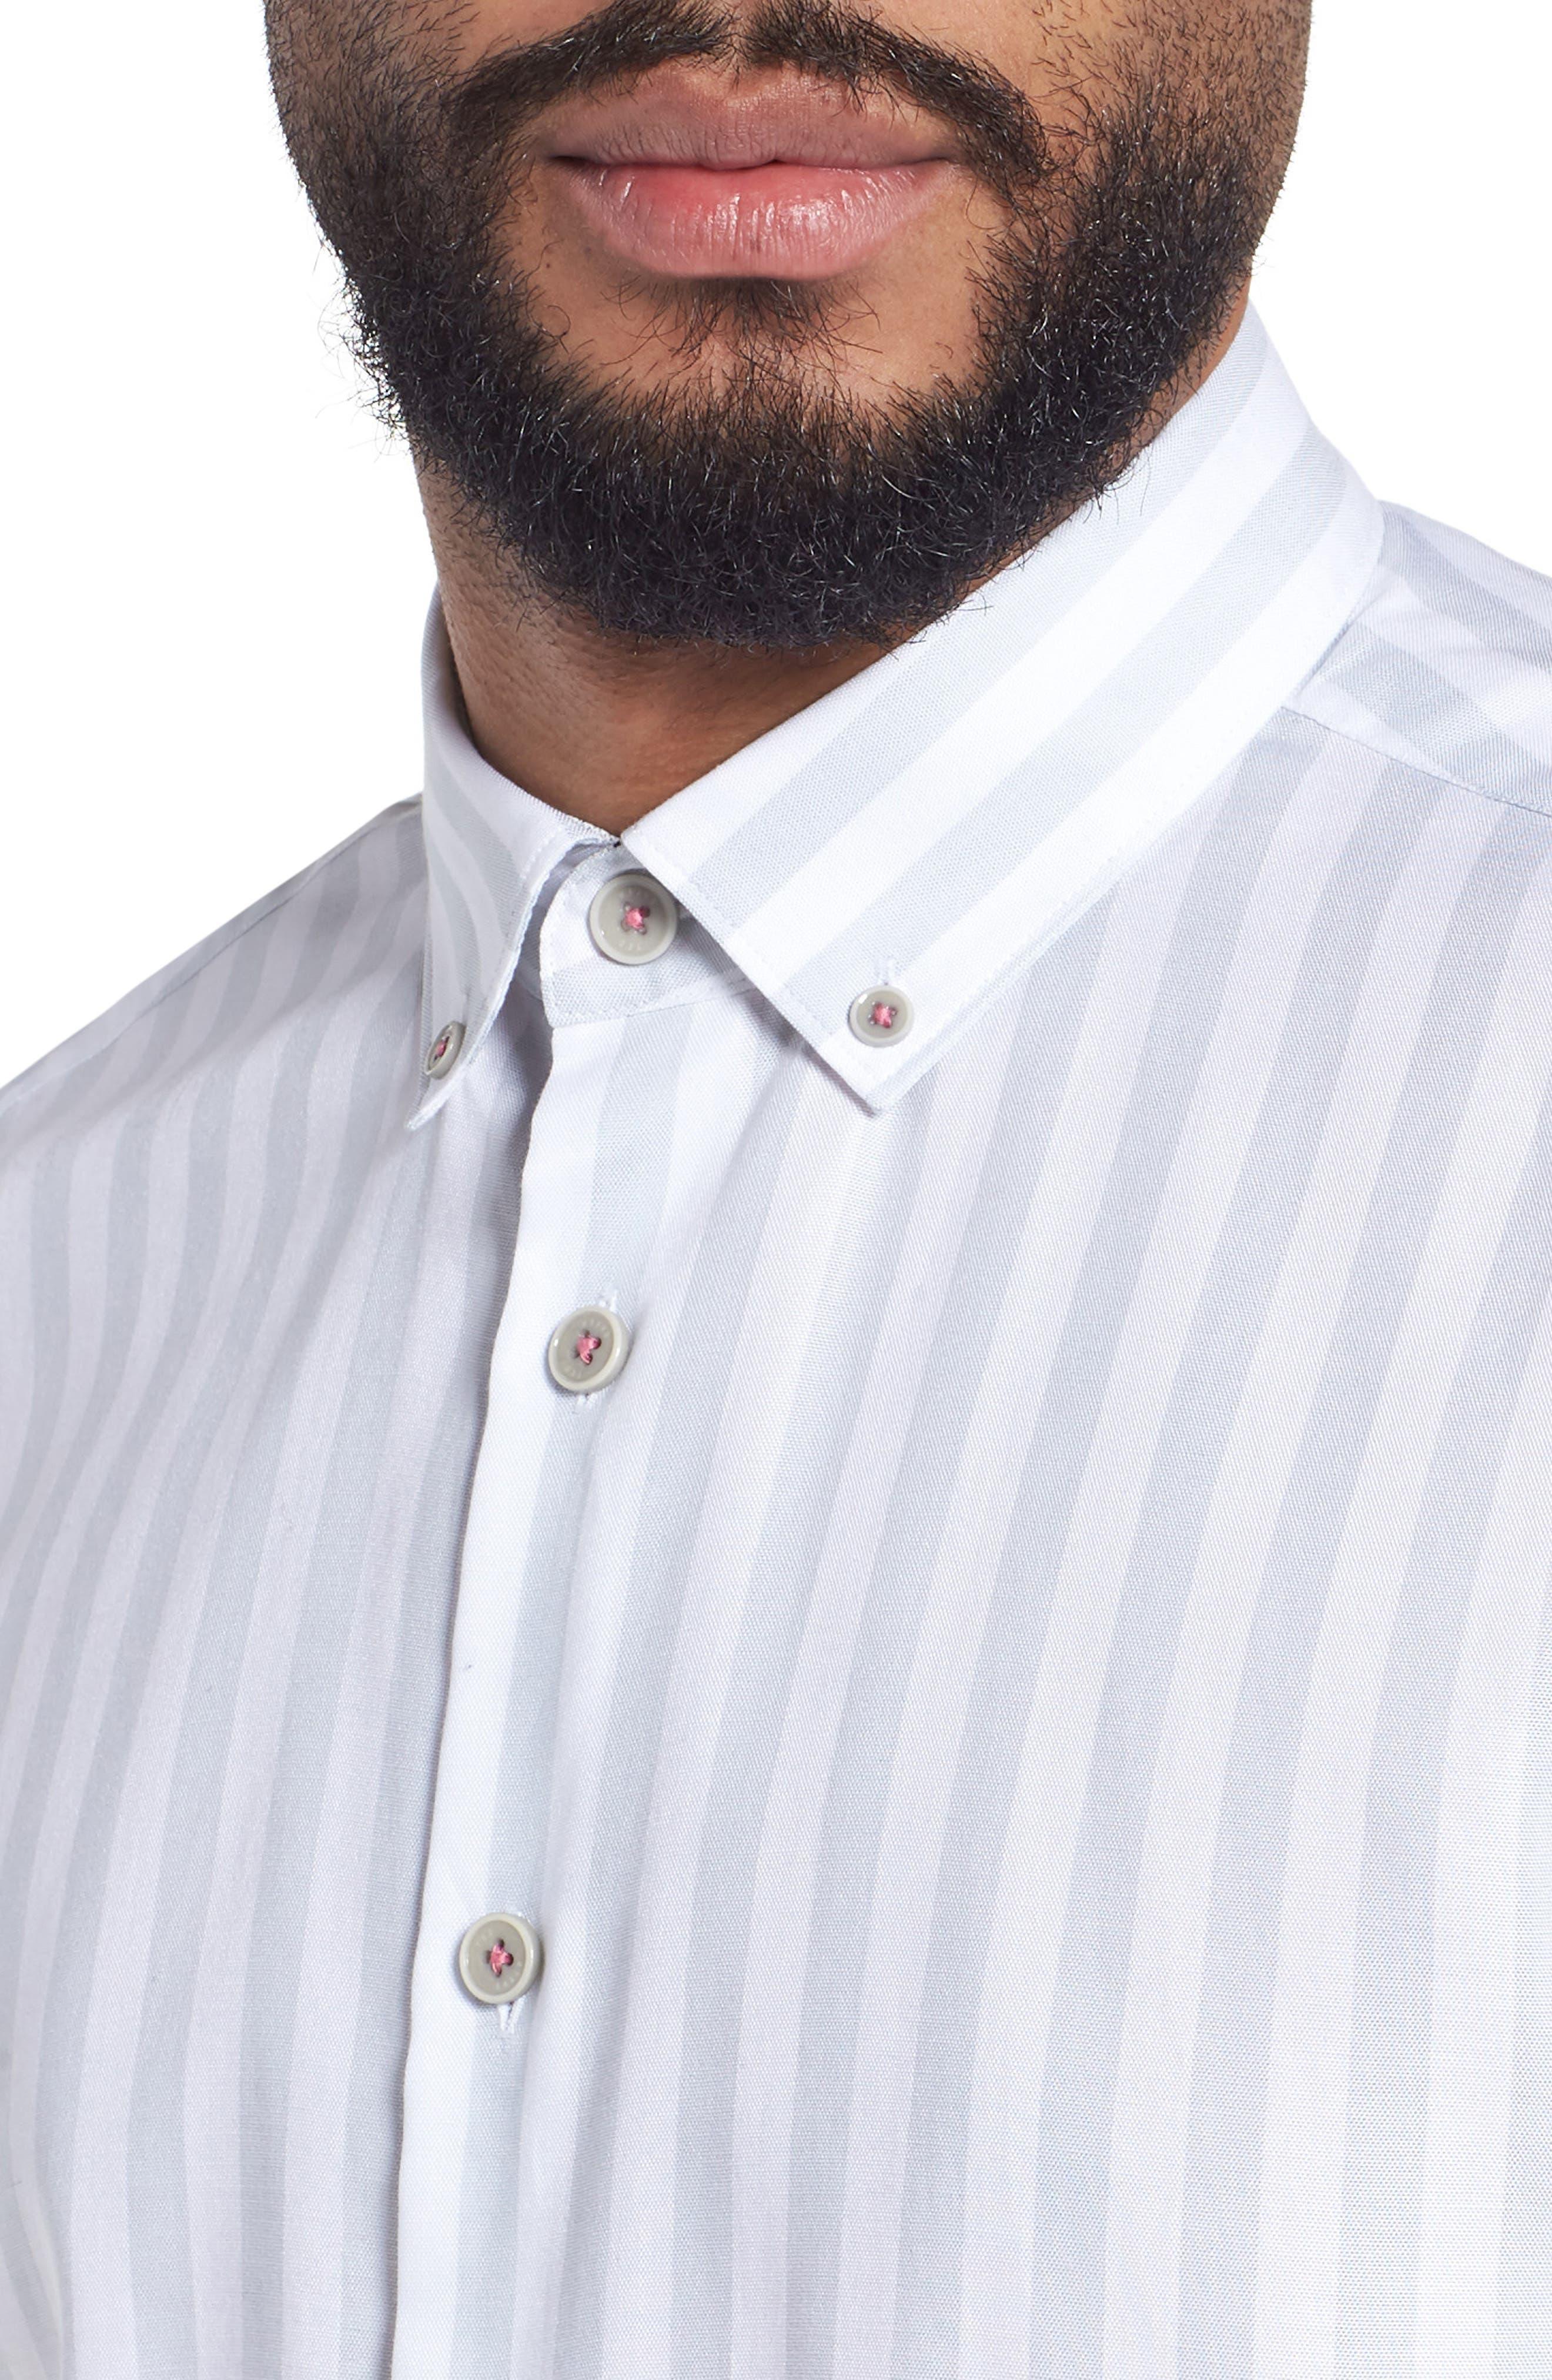 TED BAKER LONDON,                             Vertical Stripe Trim Fit Short Sleeve Sport Shirt,                             Alternate thumbnail 4, color,                             311